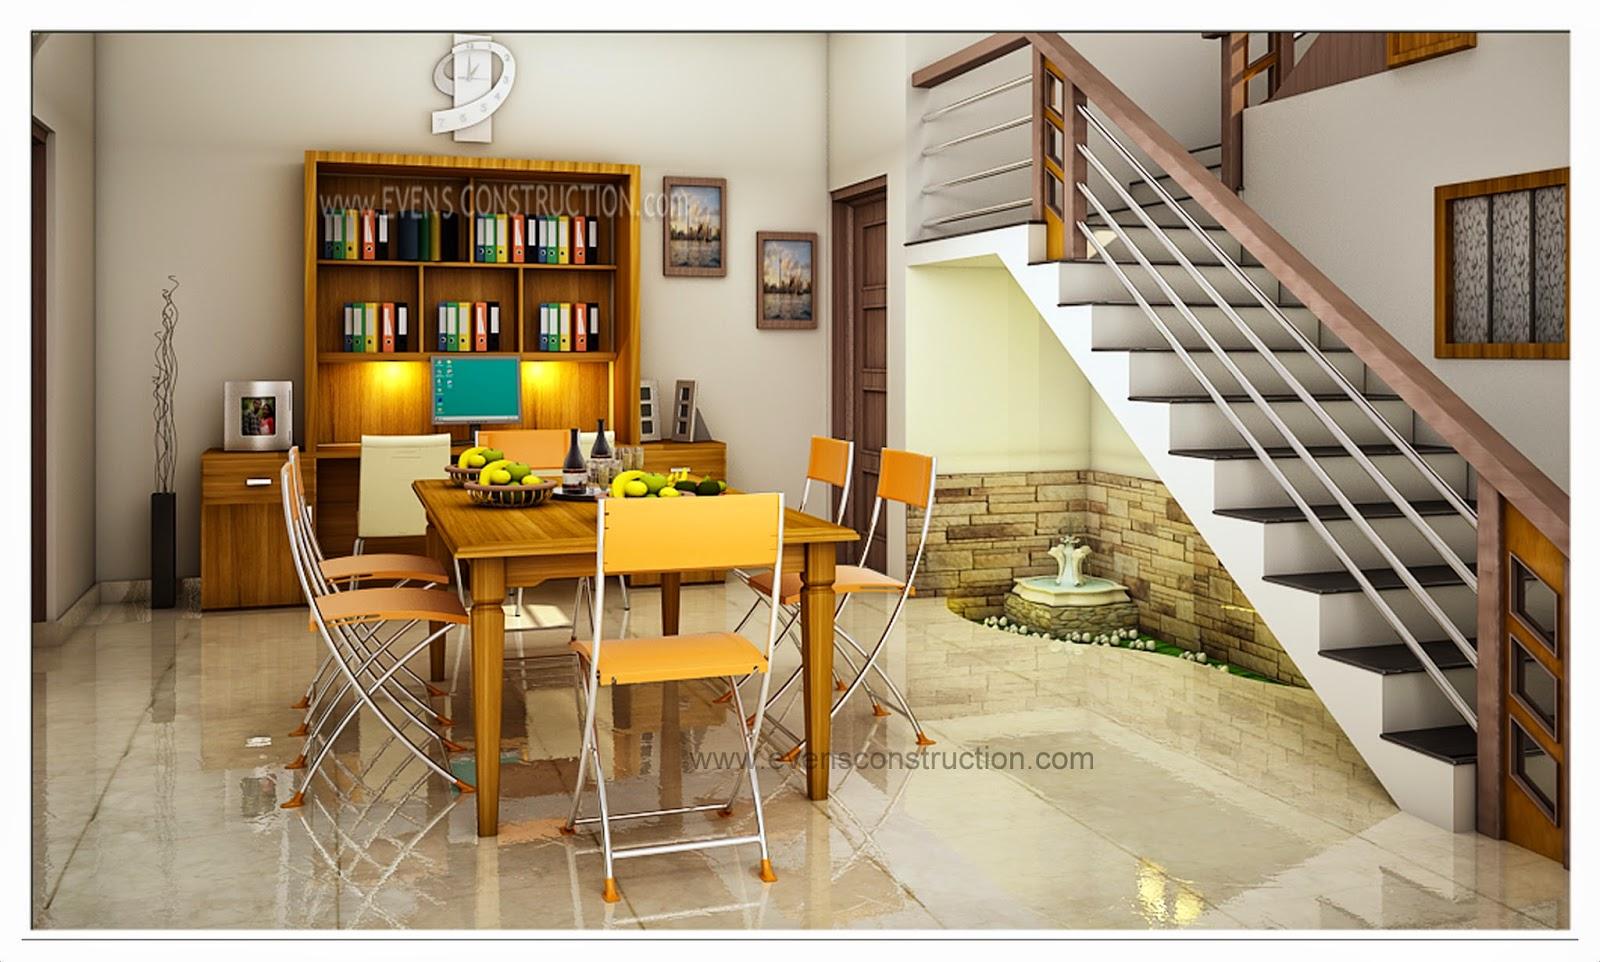 Evens Construction Pvt Ltd: Beautiful Interior Design For